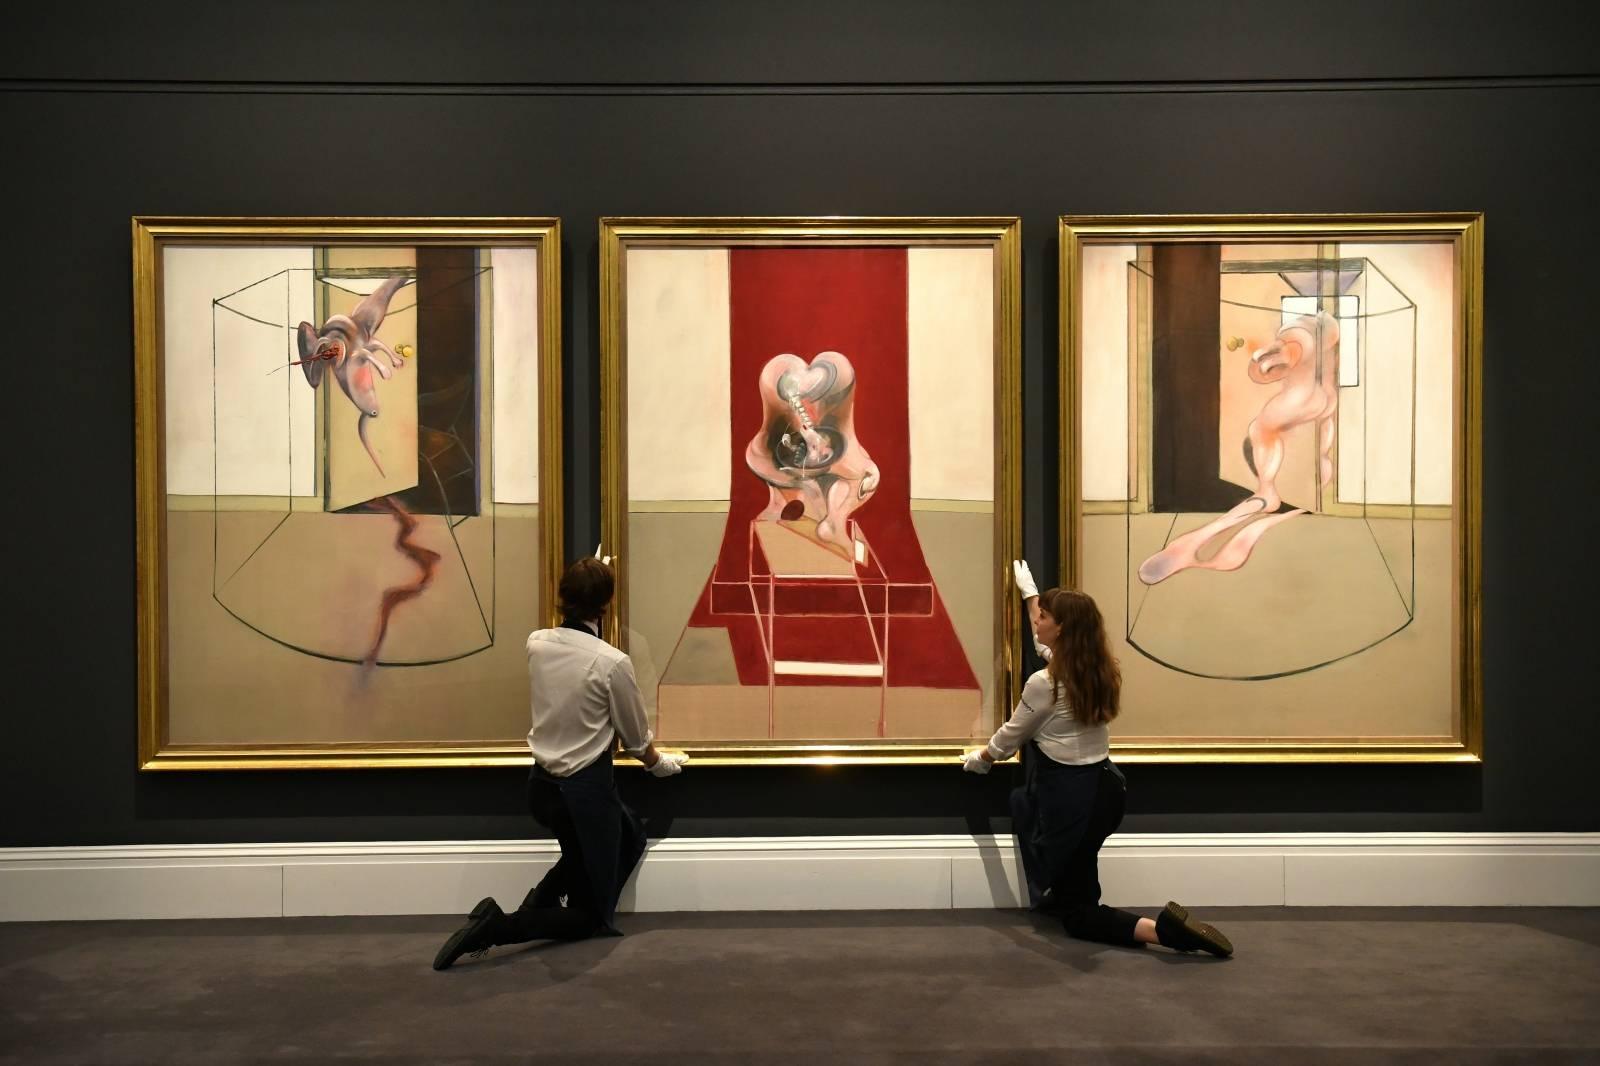 Sotheby's contemporary art sale